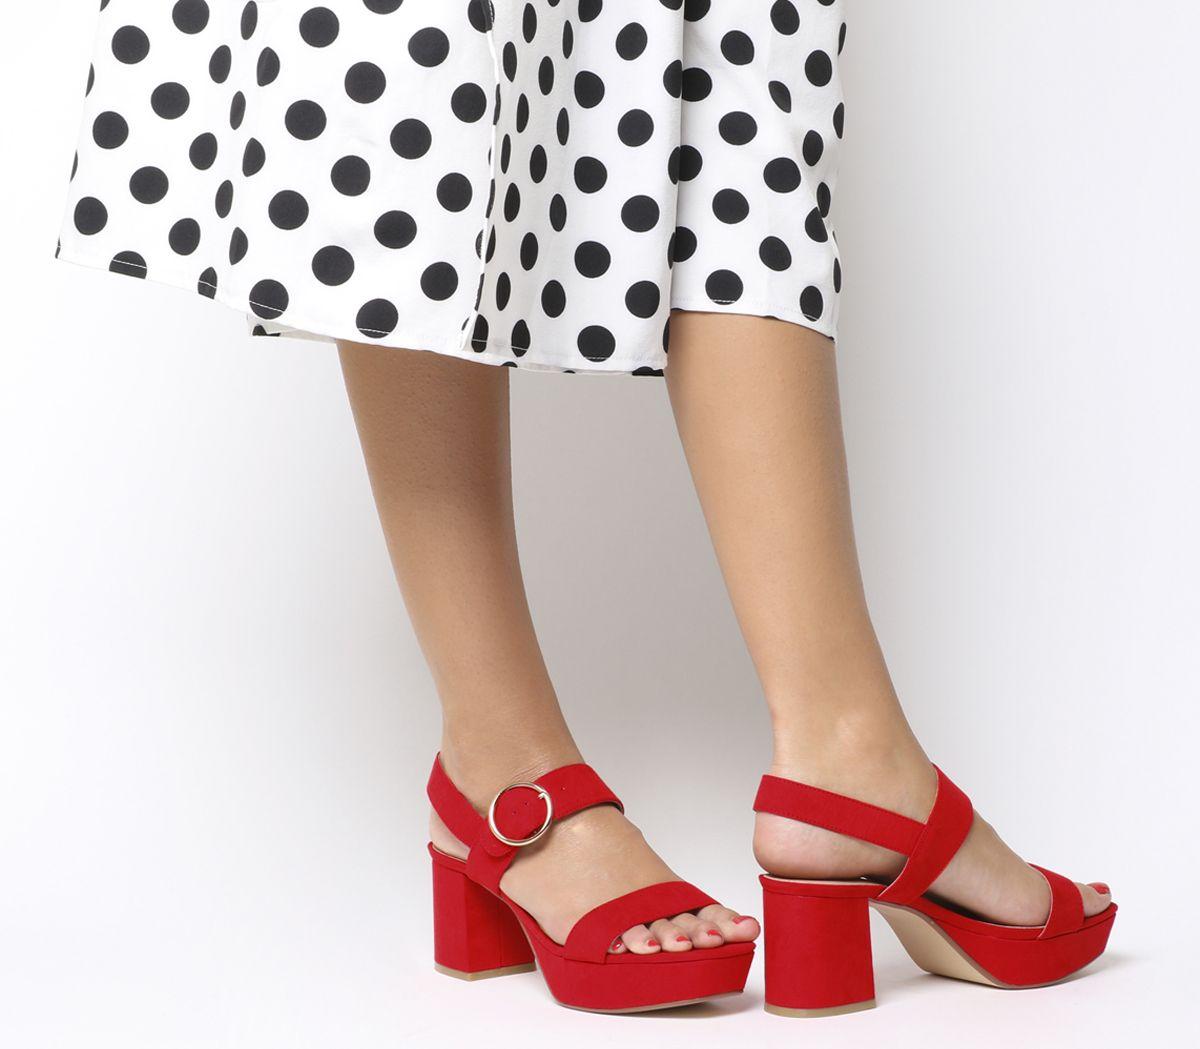 7d6cd13c4b Office Mouse Platform Sandals Red - Mid Heels